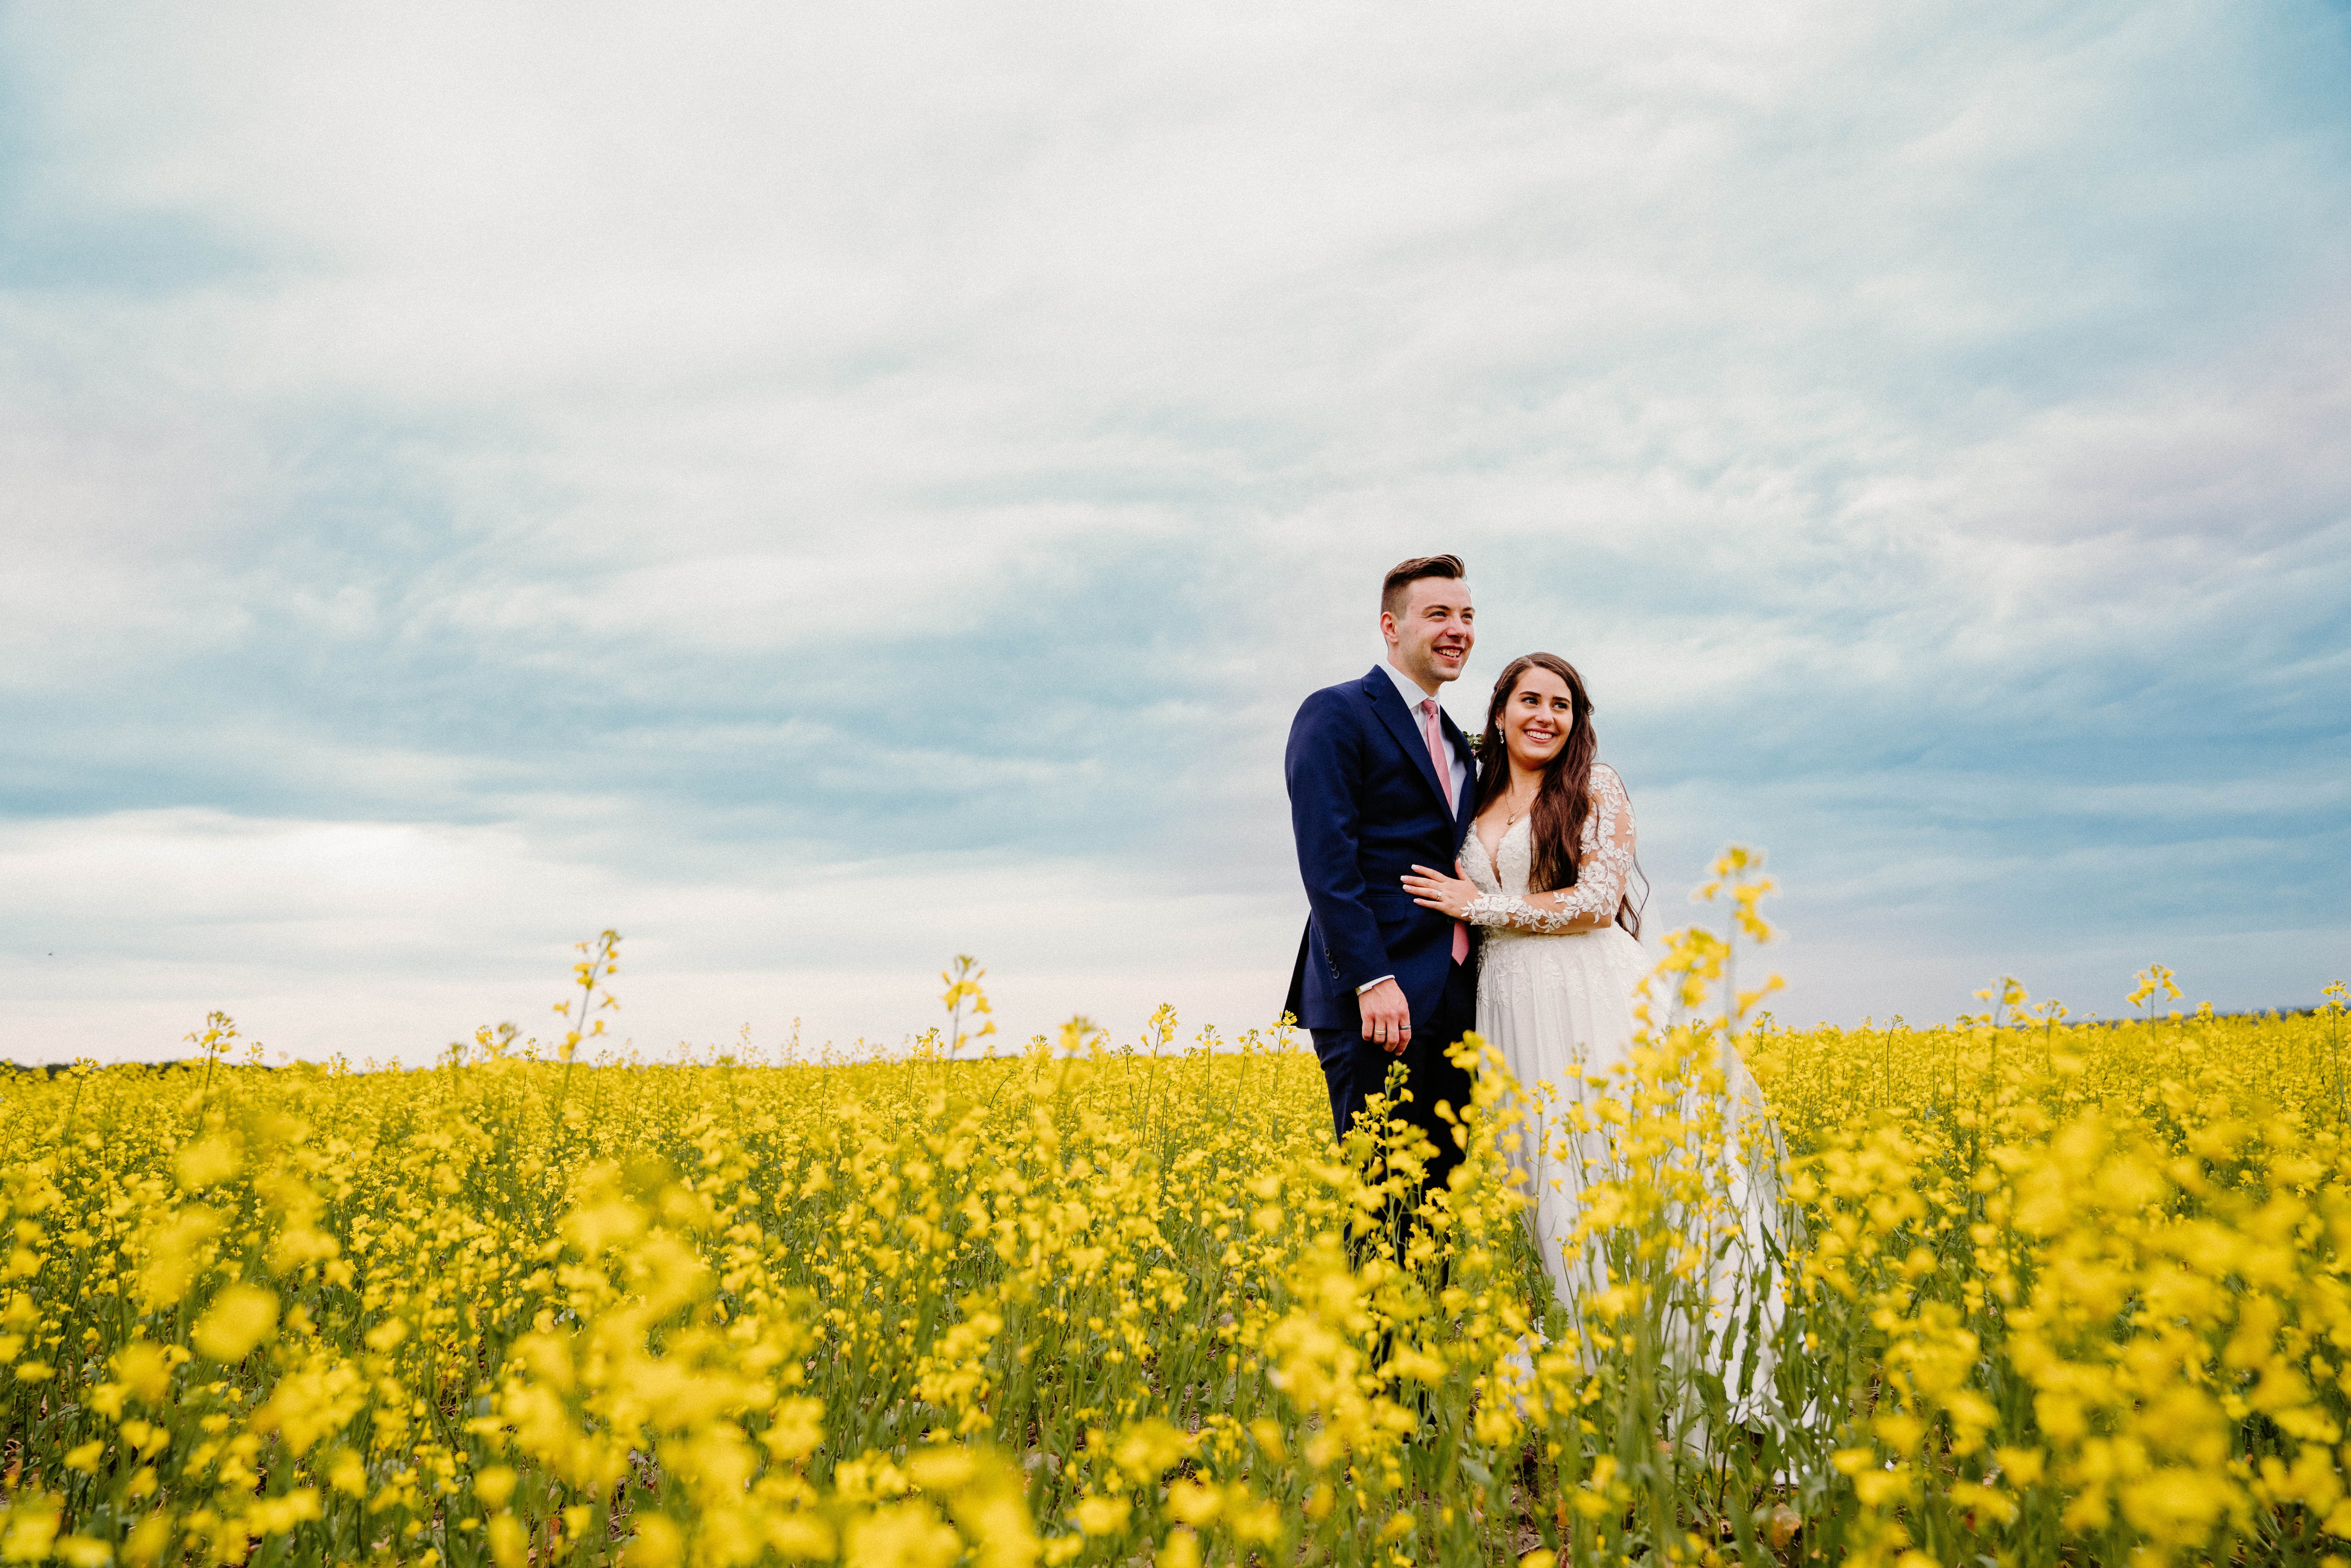 Gabrielle + Parker | Calgary, Canada | Hillrise Ranch